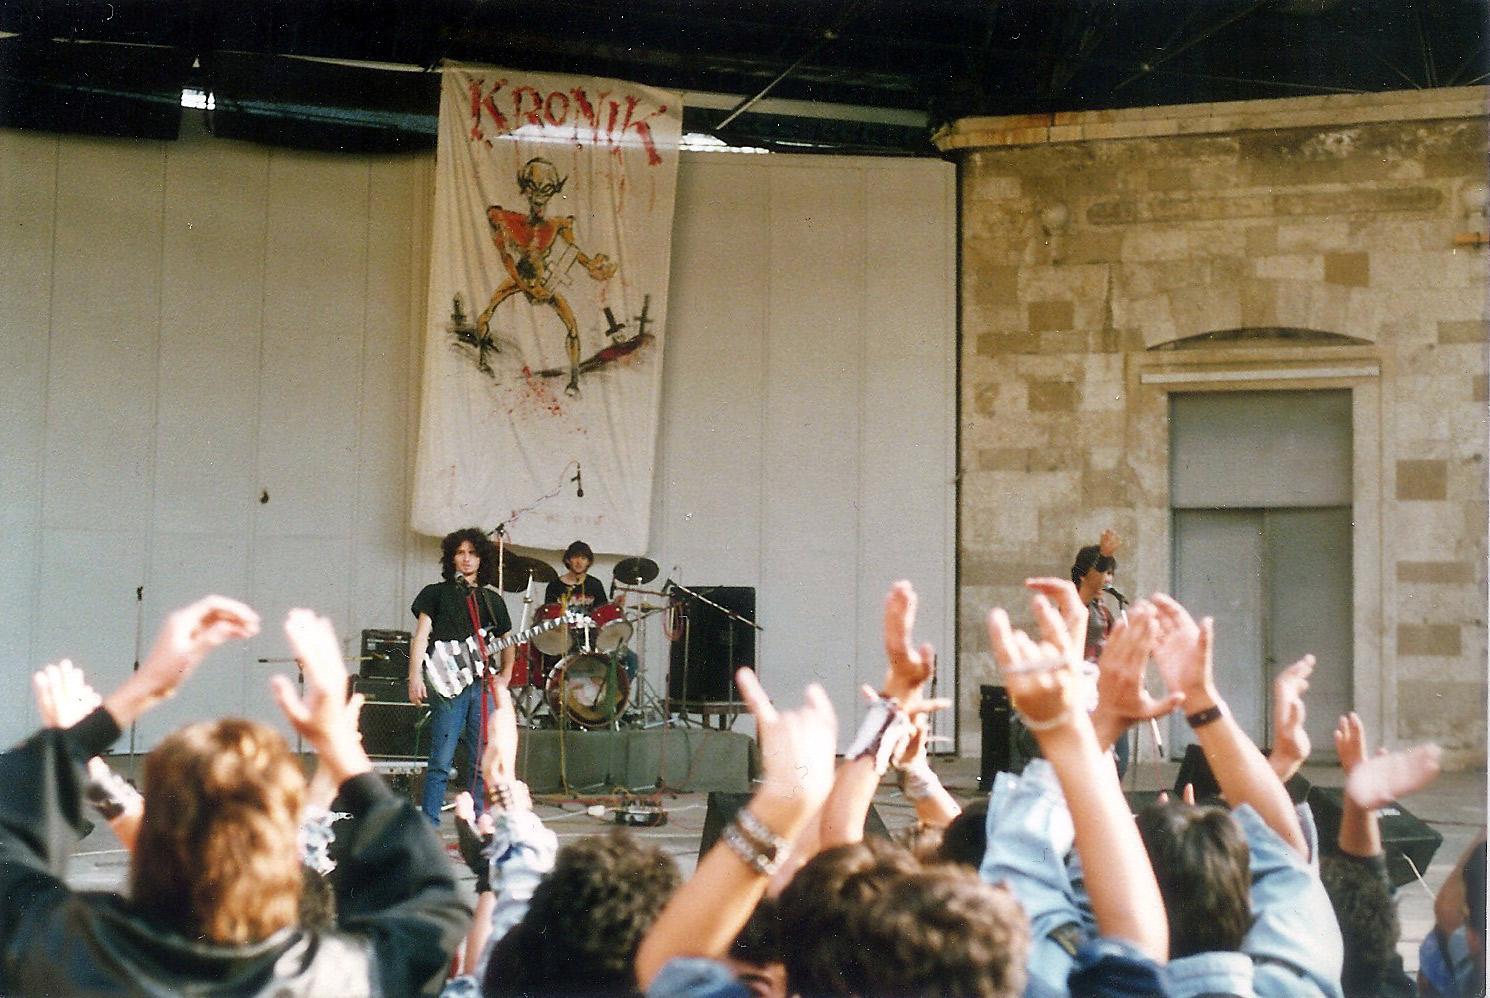 1989-10-07-Kronik-(4)